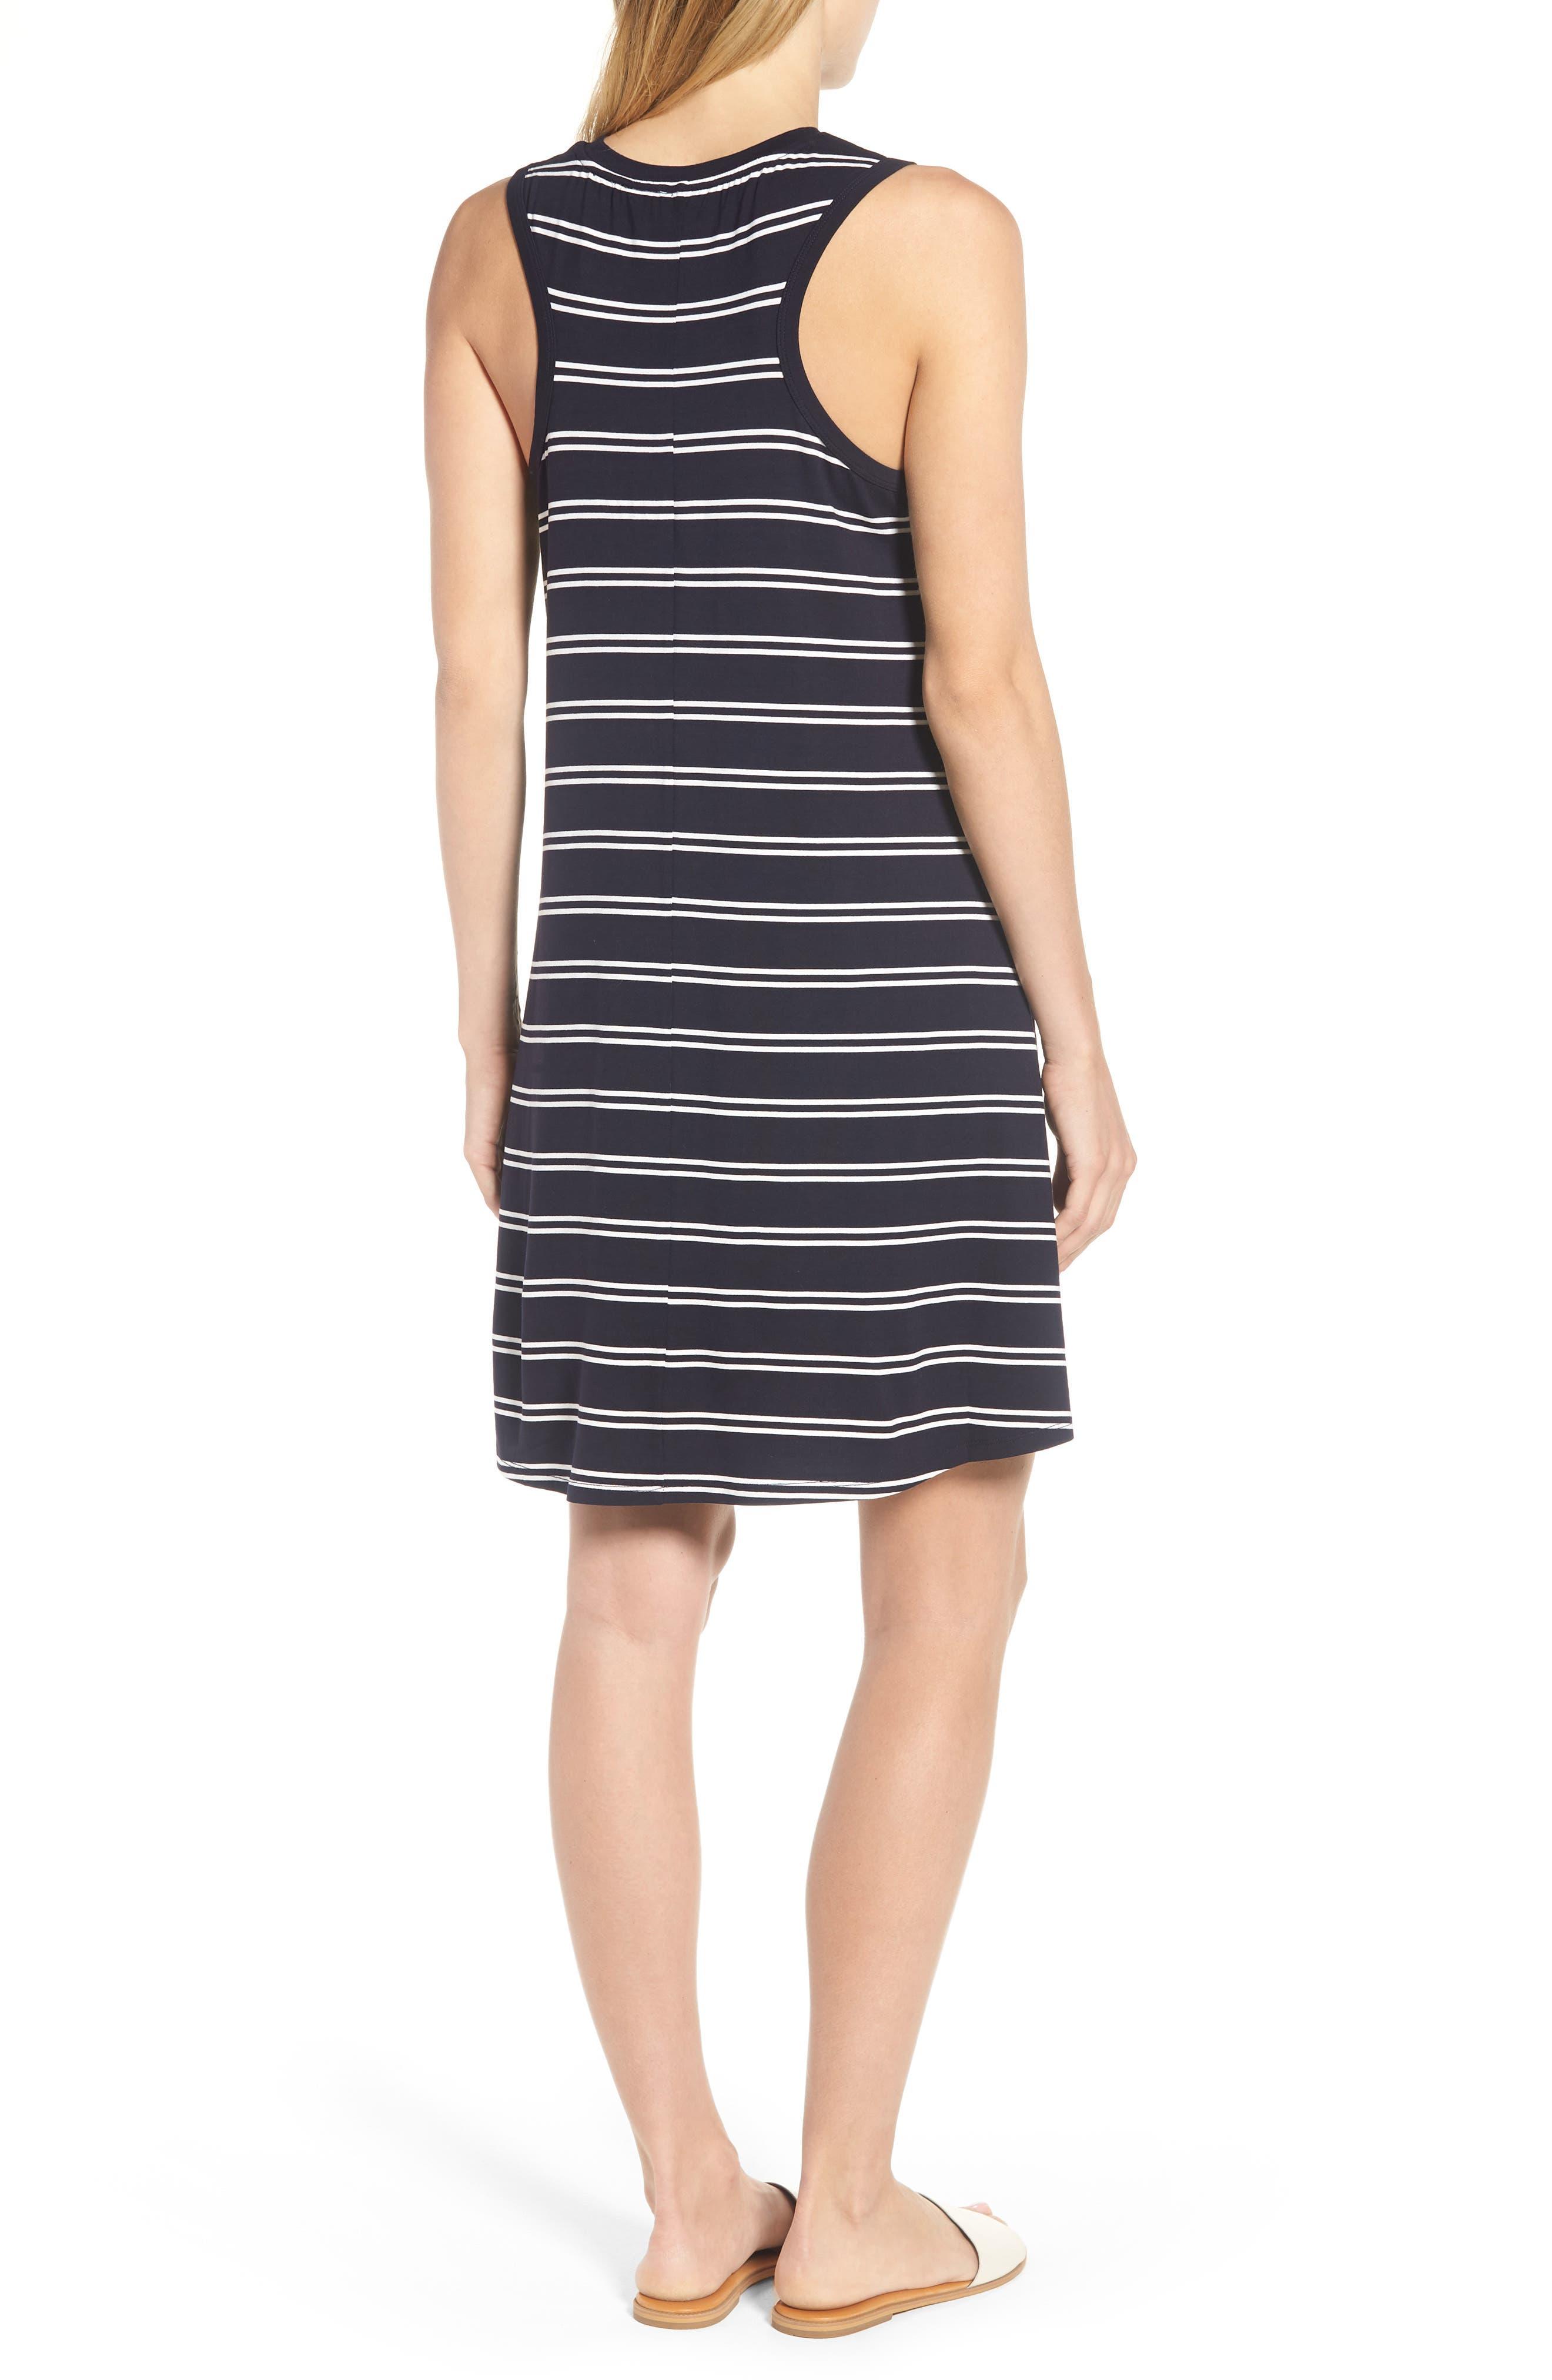 Stripe Tank Dress,                             Alternate thumbnail 2, color,                             Deepest Navy White